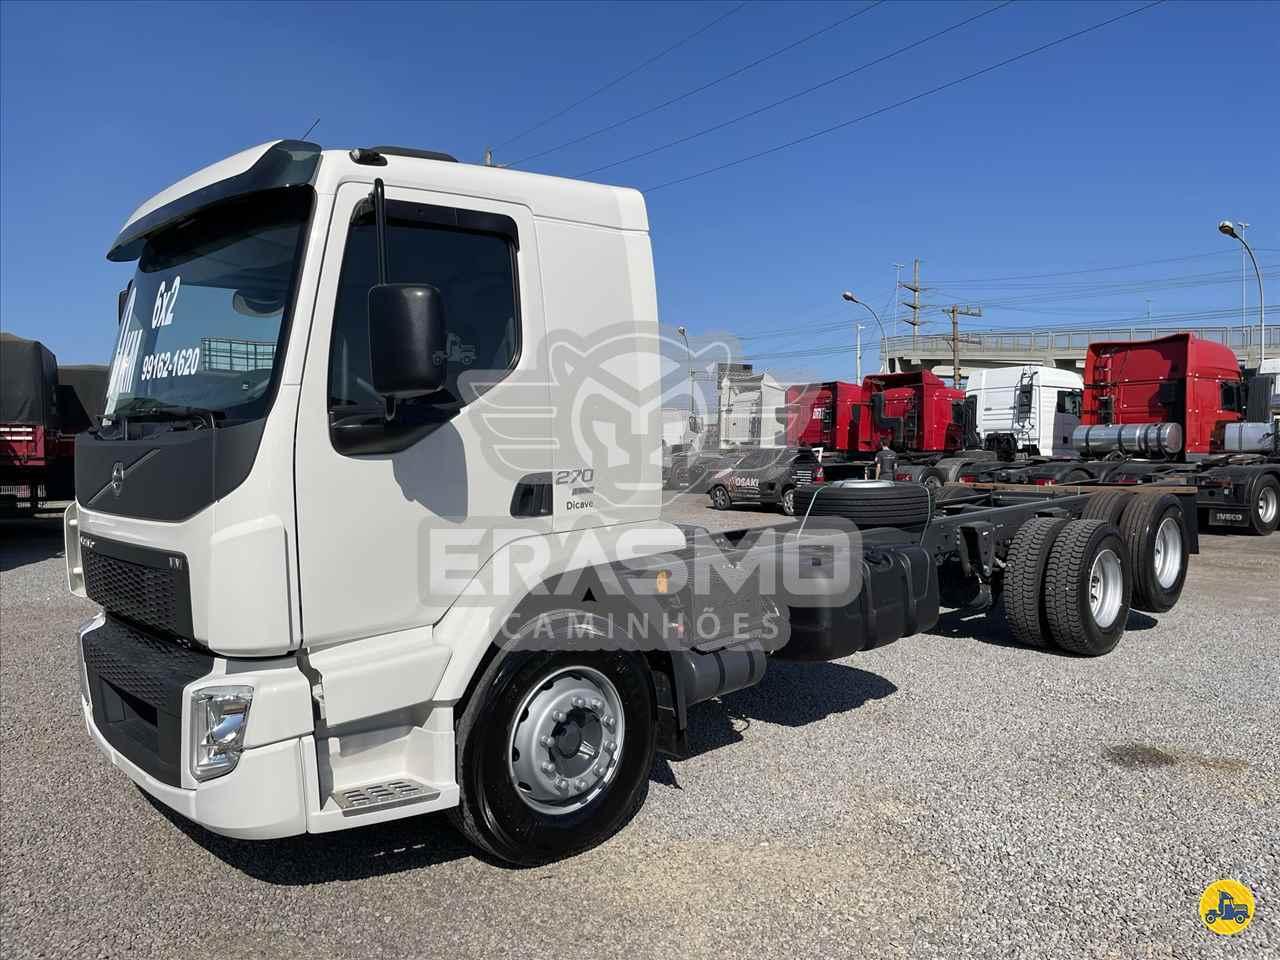 CAMINHAO VOLVO VOLVO VM 270 Chassis Truck 6x2 Erasmo Caminhões TUBARAO SANTA CATARINA SC